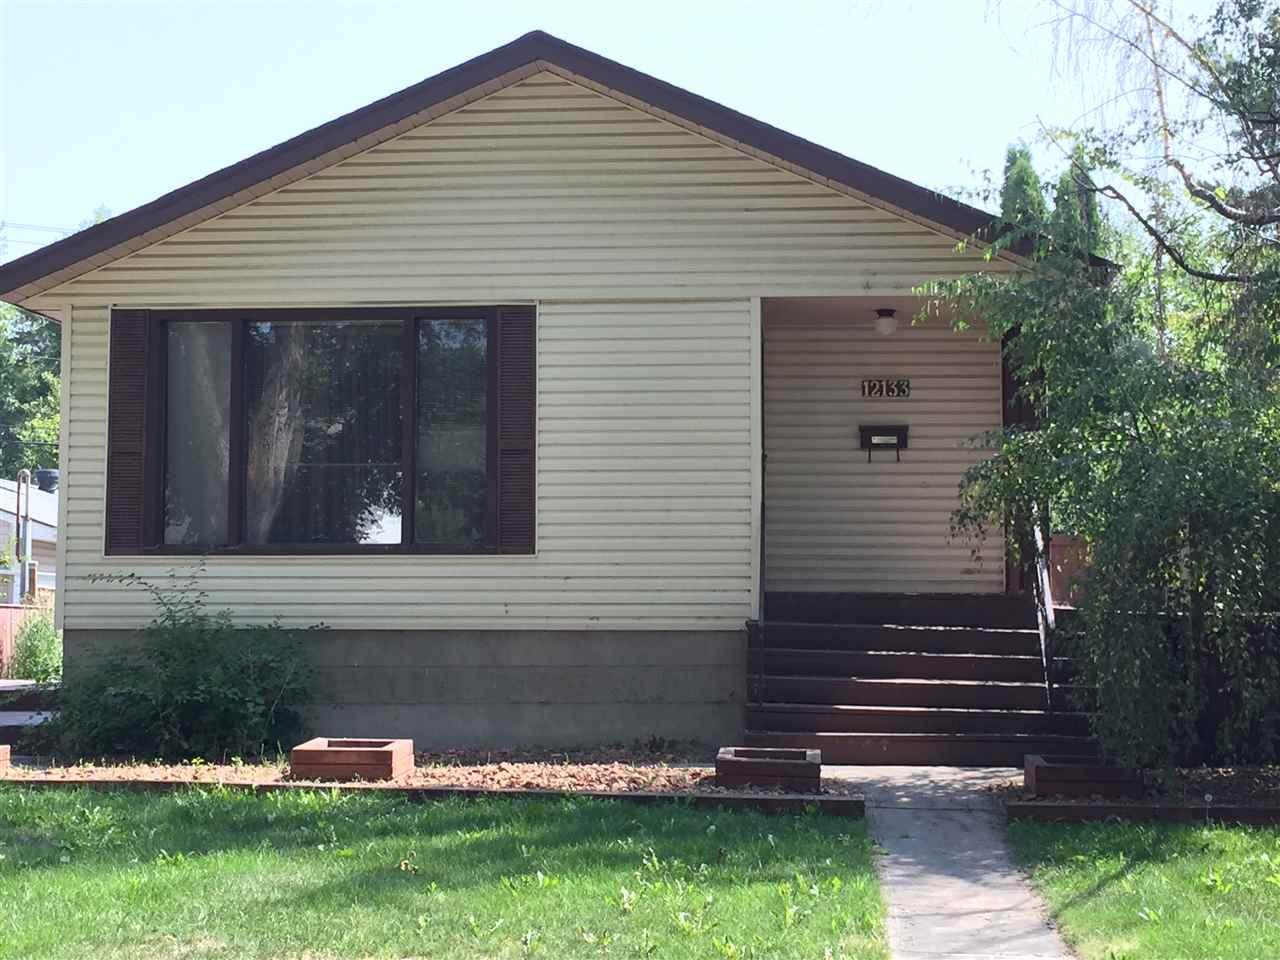 12133 58 Street, 3 bed, 1 bath, at $249,000